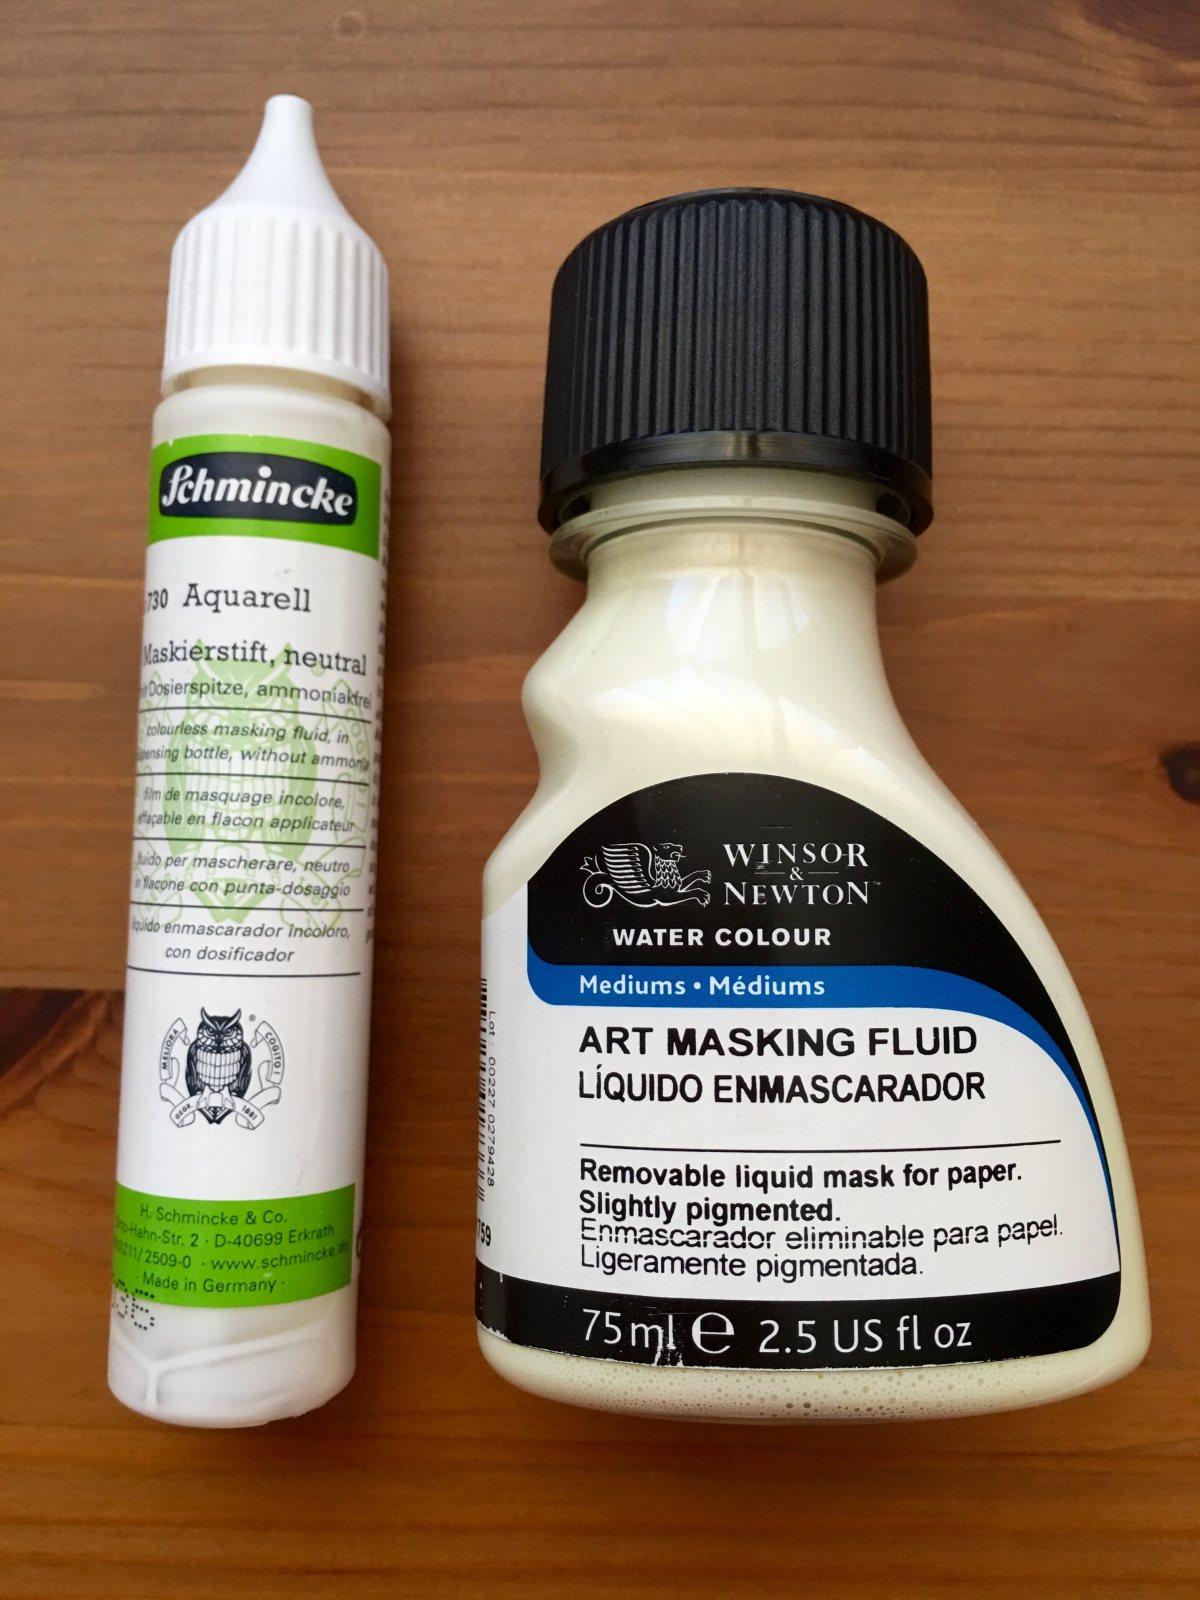 Schmincke, Winsor & Newton, China Marker, Wax Resist masking fluid demo